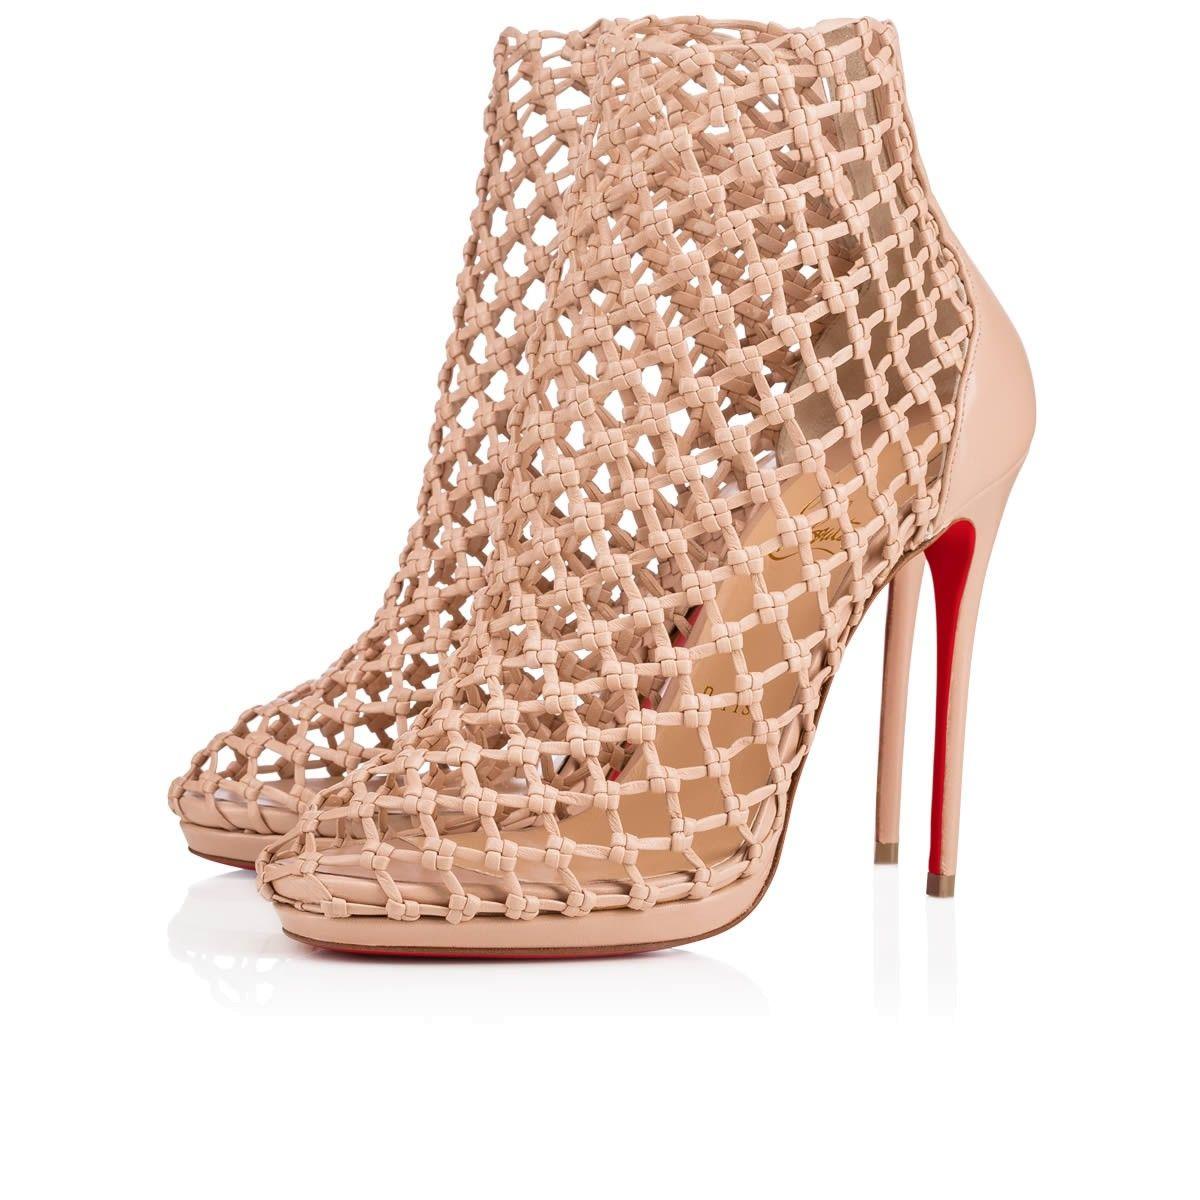 lowest price 8787a 5d9cc CHRISTIAN LOUBOUTIN Porligat. #christianlouboutin #shoes ...